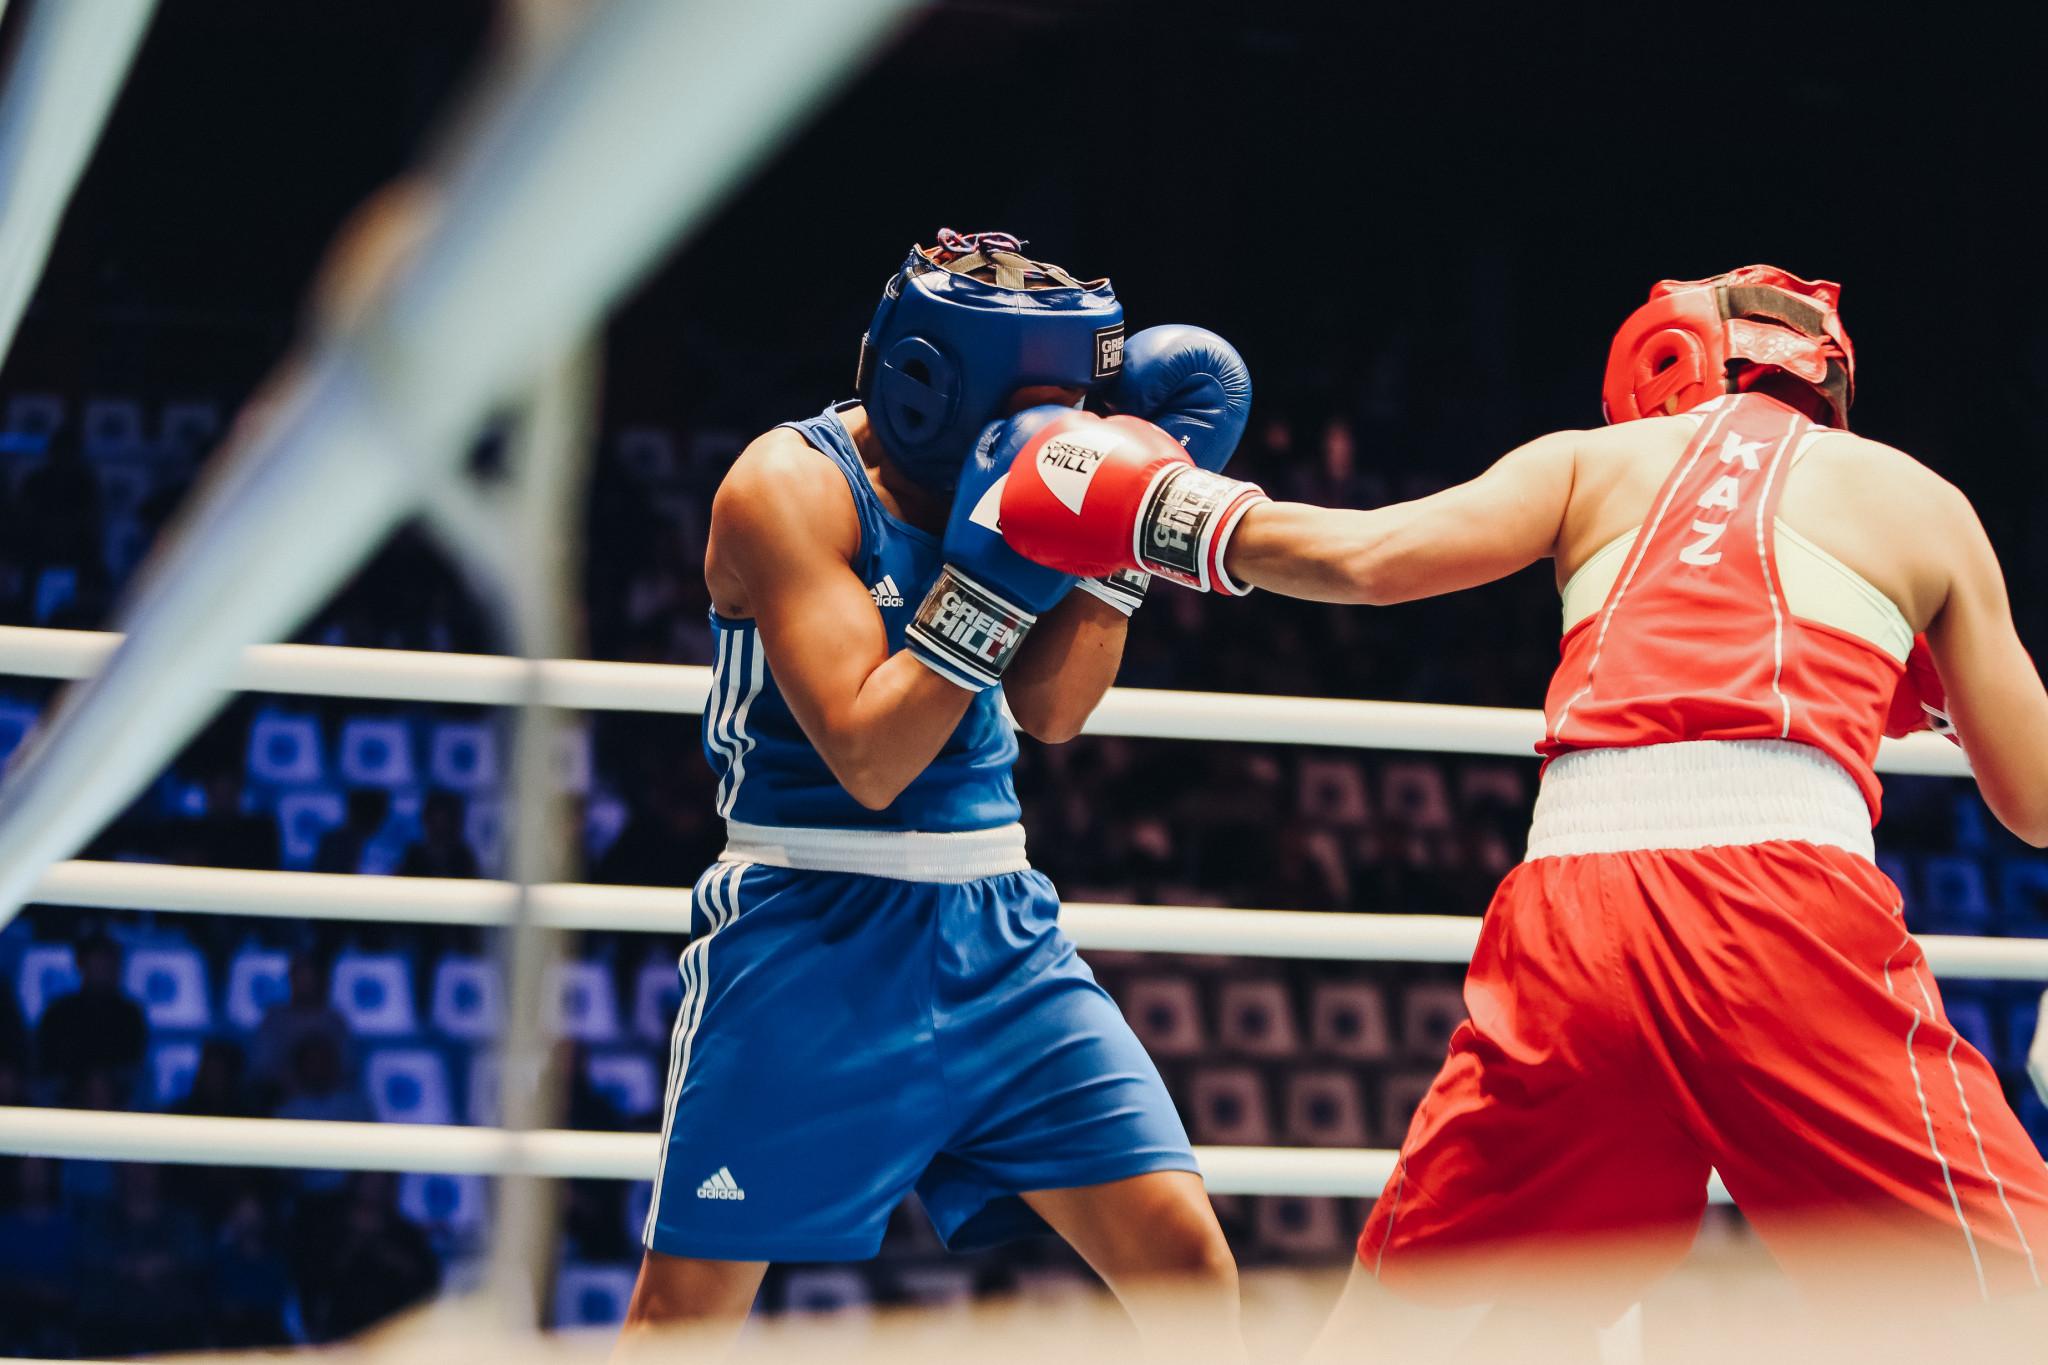 Another Dutch boxer, Jemyma Betrian, narrowly beat Aizhan Khojabekova of Kazakhstan 3-2 ©AIBA